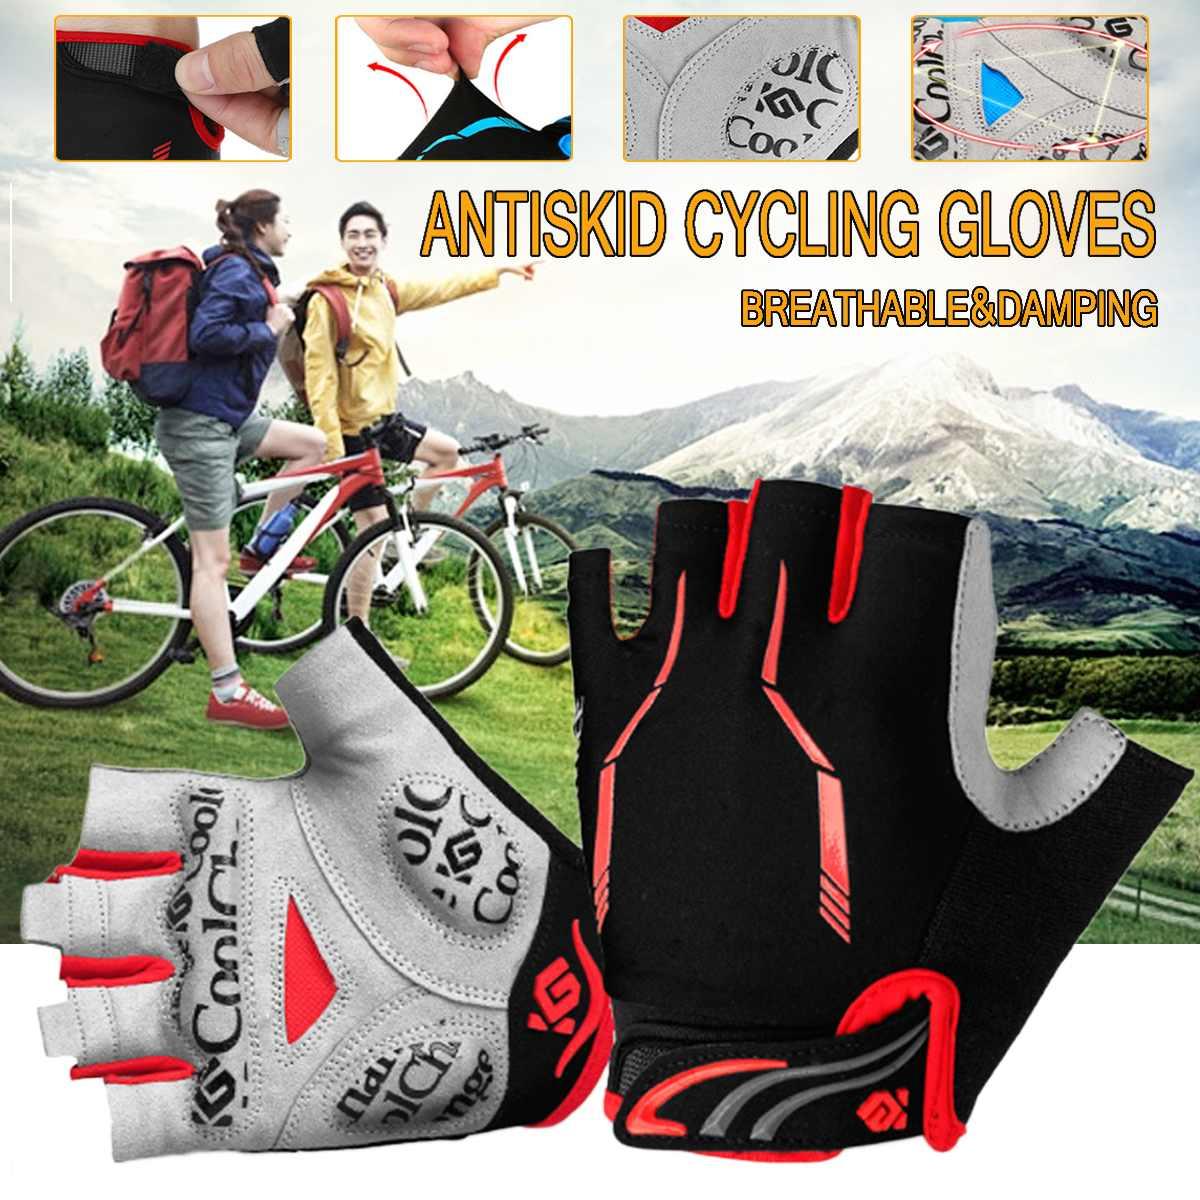 Antiskid Cycling Gloves Road Bike GlovesShockproof MTB Road Half Finger Bicycle Glove For Men Woman Fingerless Sports Gloves